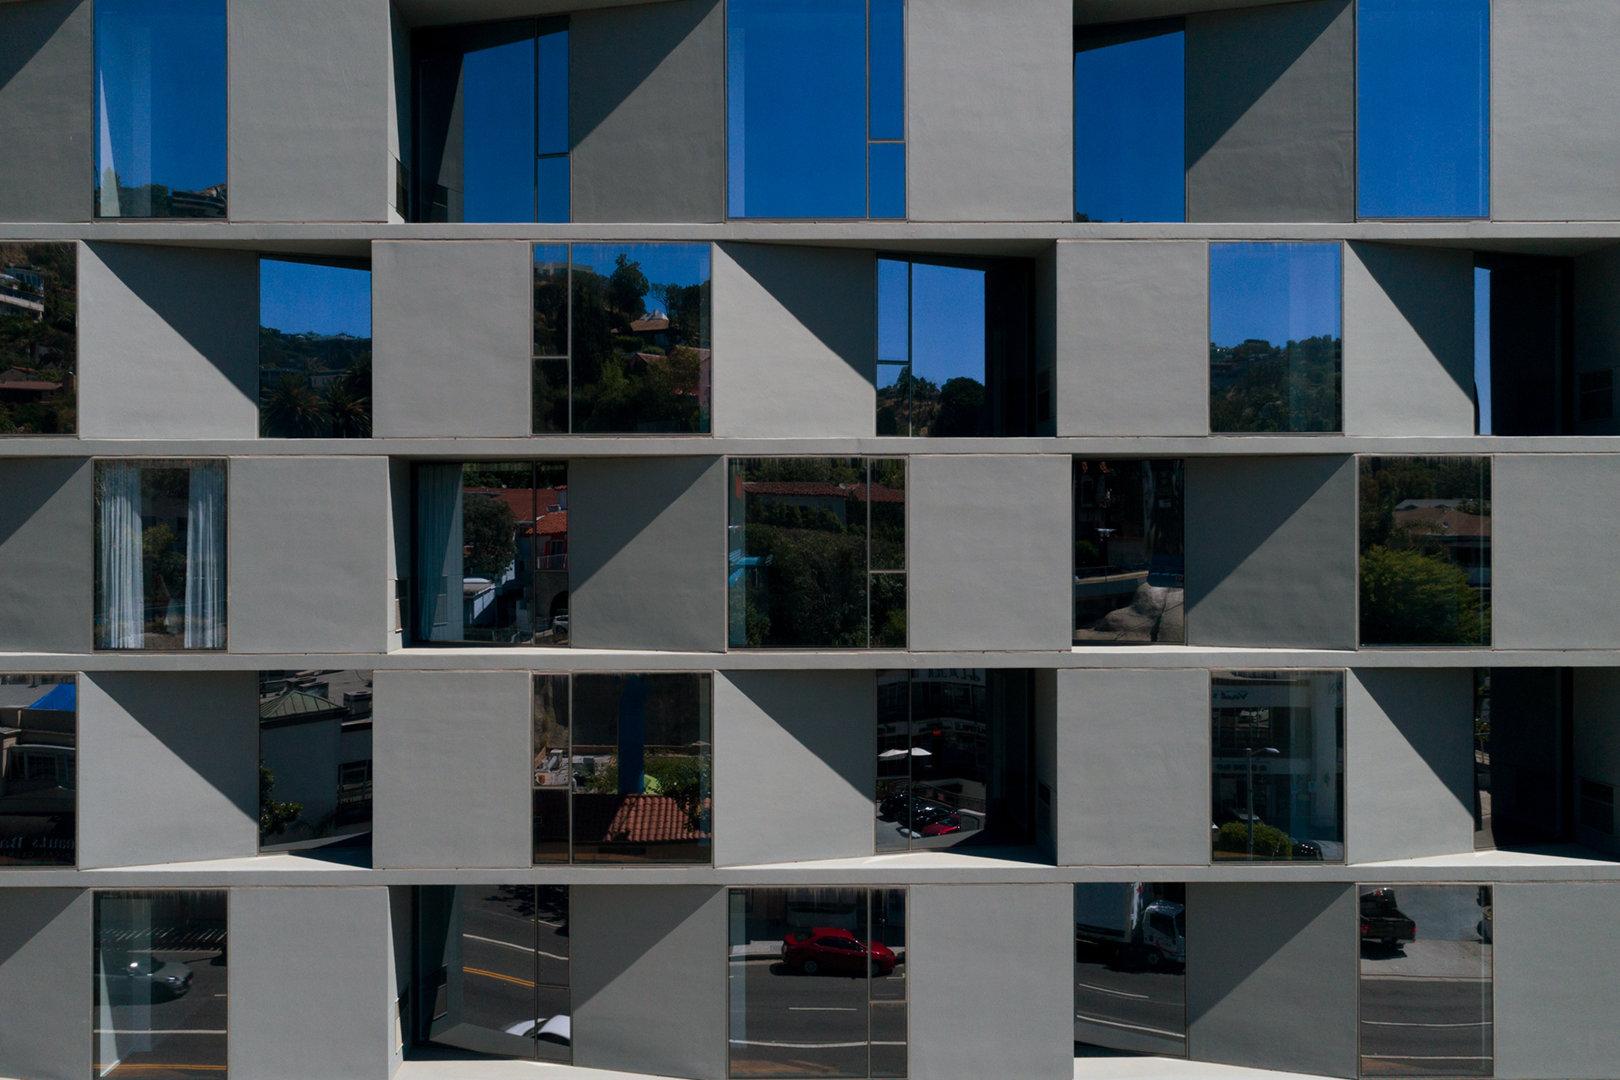 Lena_SLC_Residences_DJI_0128_WEB.jpg